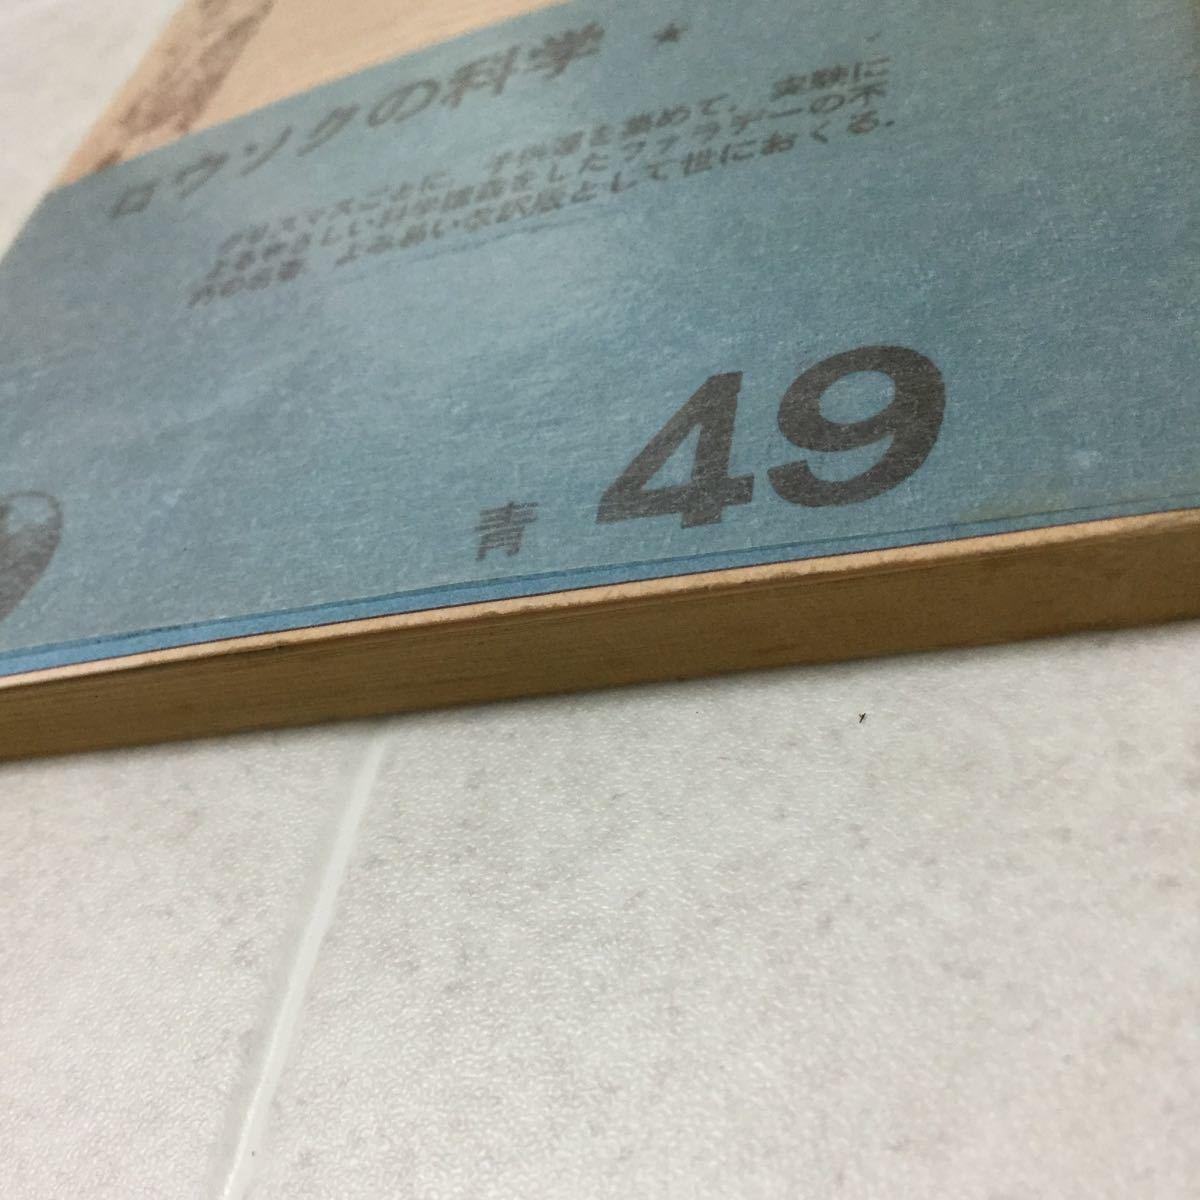 a2 ロウソクの科学 岩波文庫 954 ファラデー 矢島祐利 青49 電気 本 化学 水 空気 水素 酸素 燃焼 炎 炭酸ガス 石炭ガス _画像2